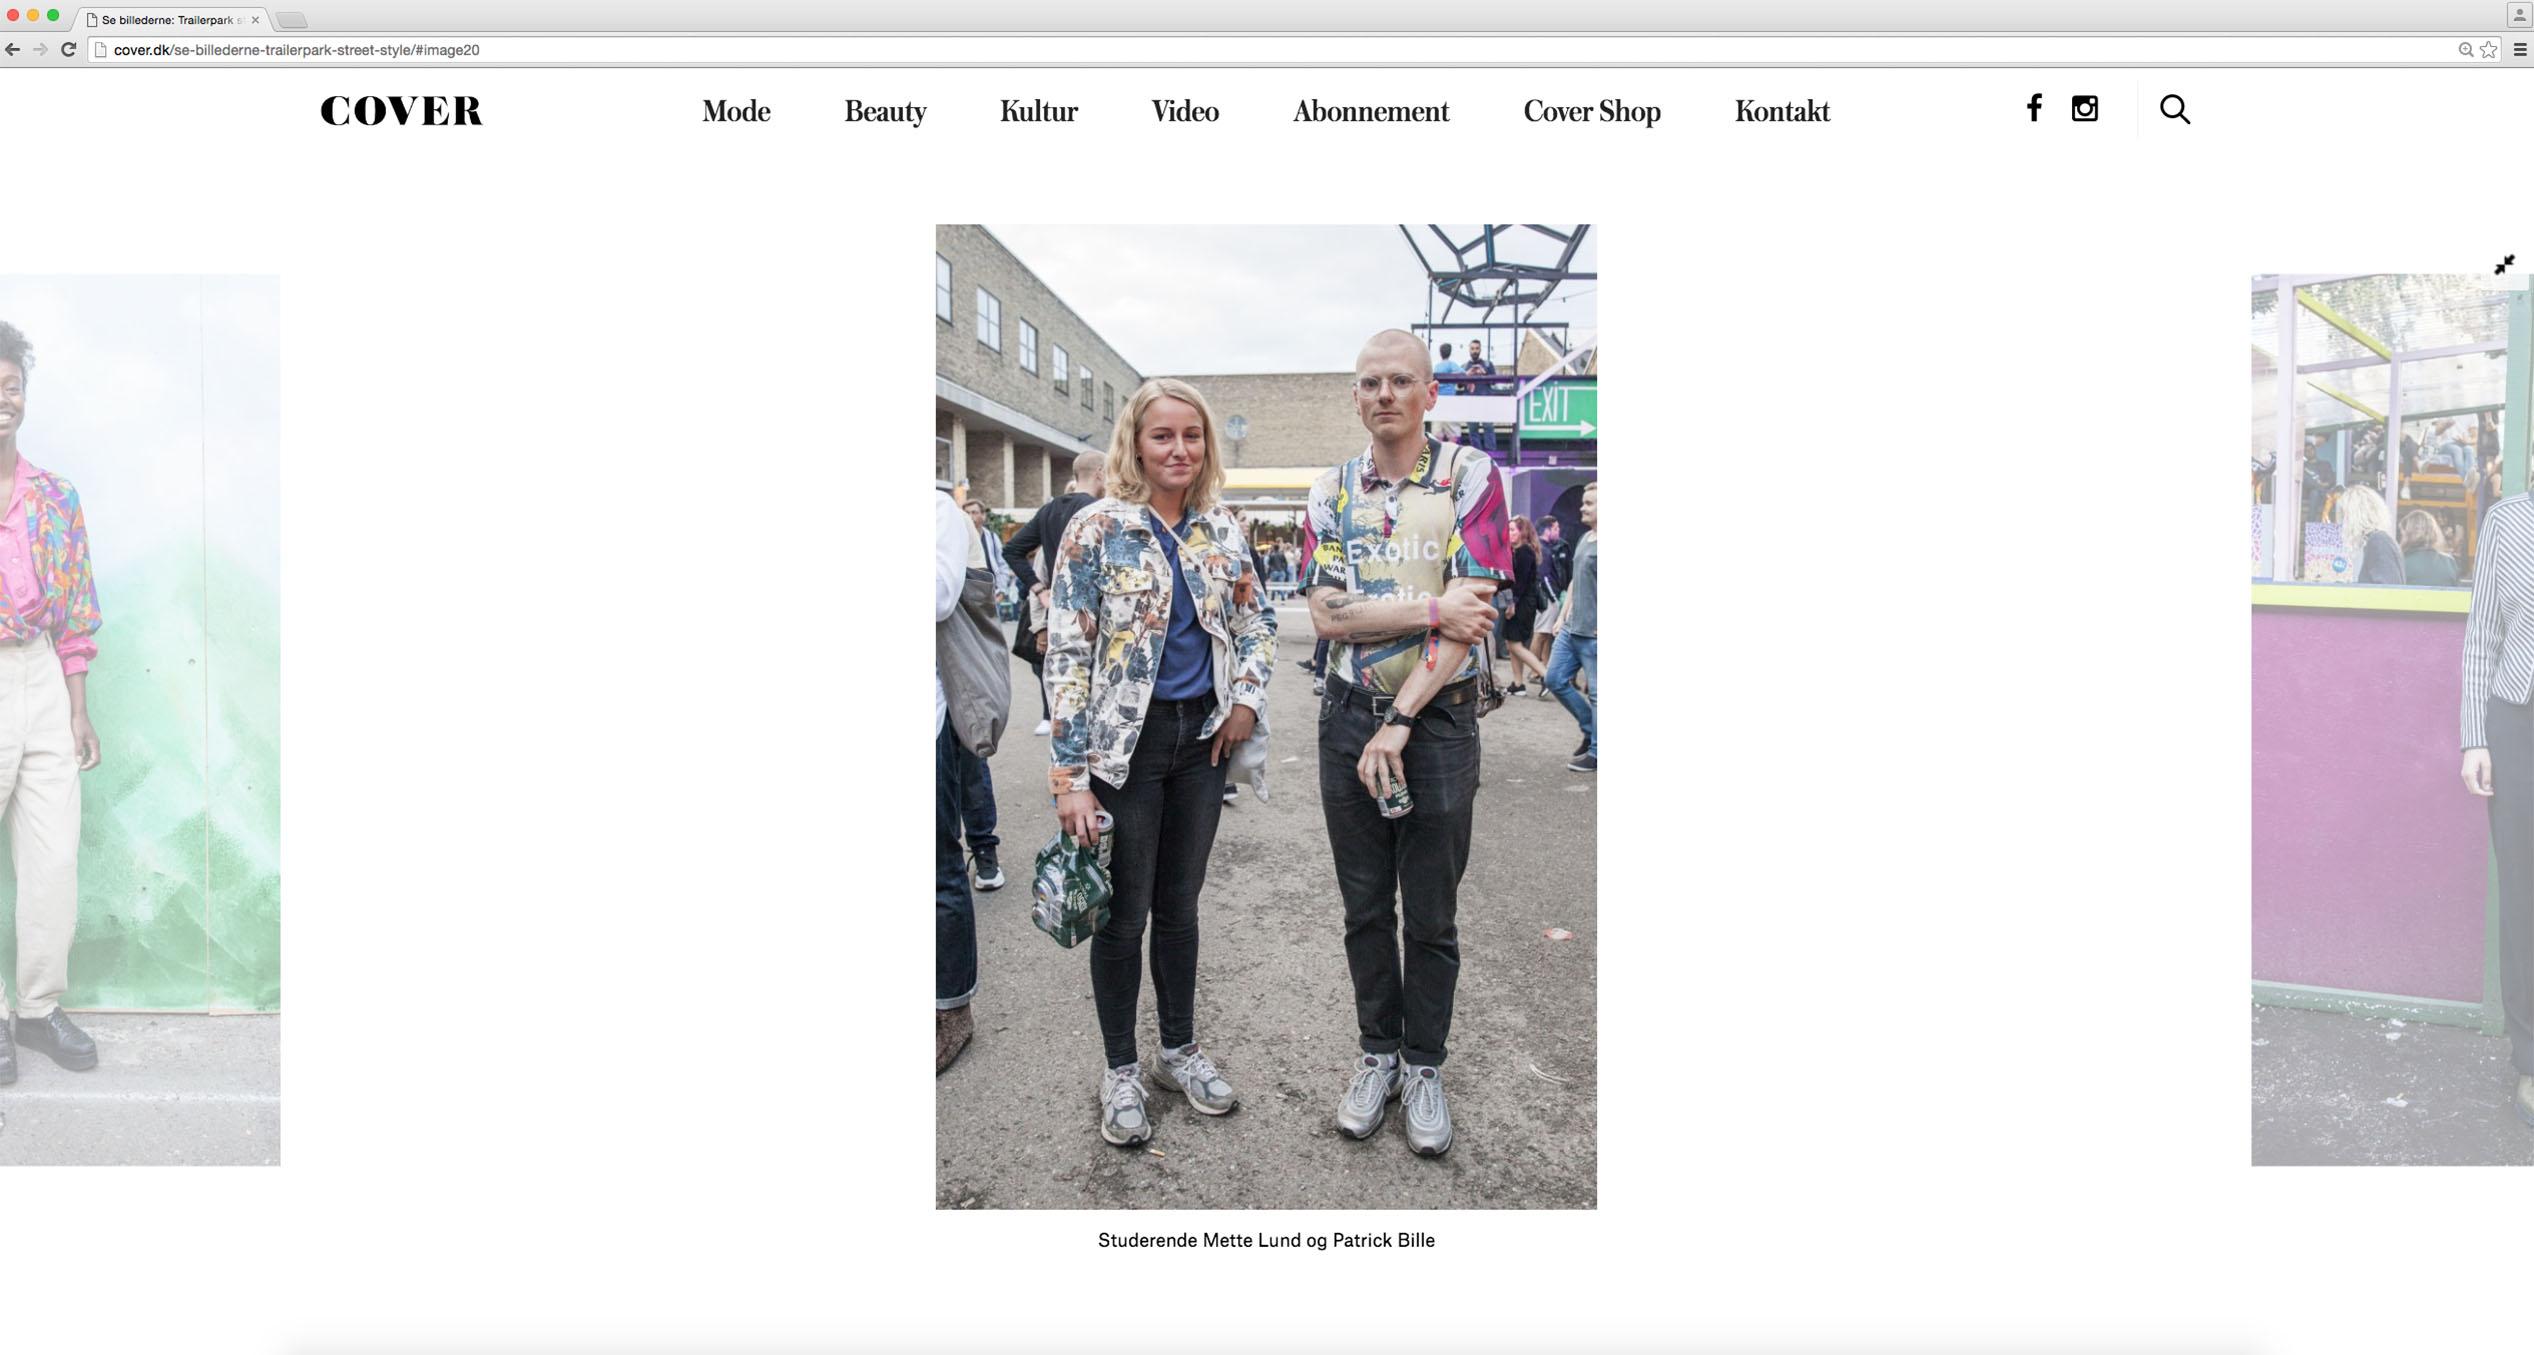 Streetstyle_CoverMagazine_TrailerparkFestival2016_20